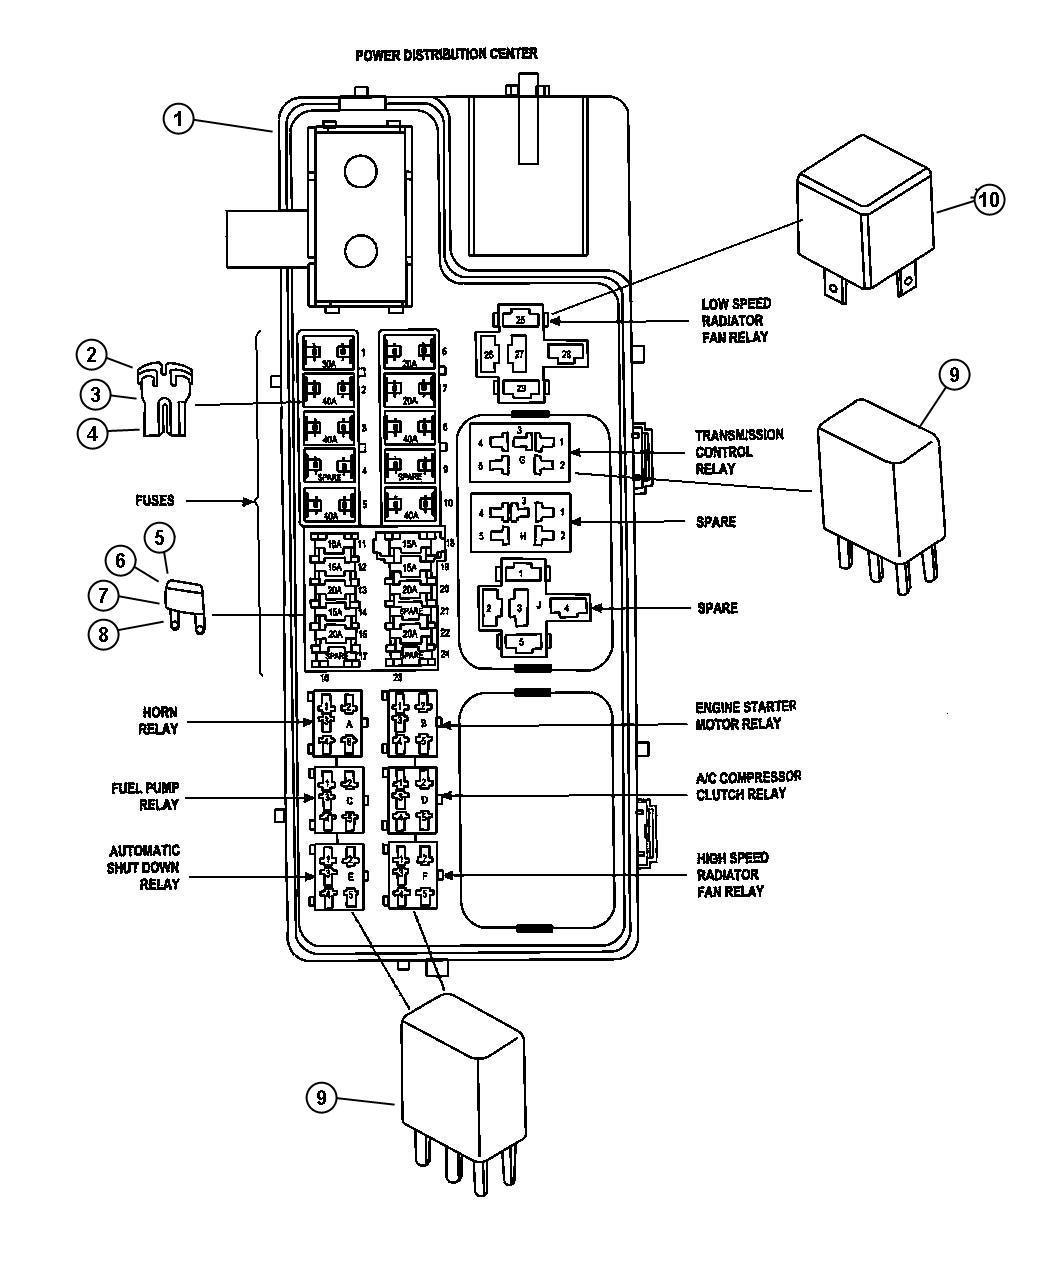 00i54981?resize\\\=665%2C808 pt cruiser radiator fan wiring trusted wiring diagram